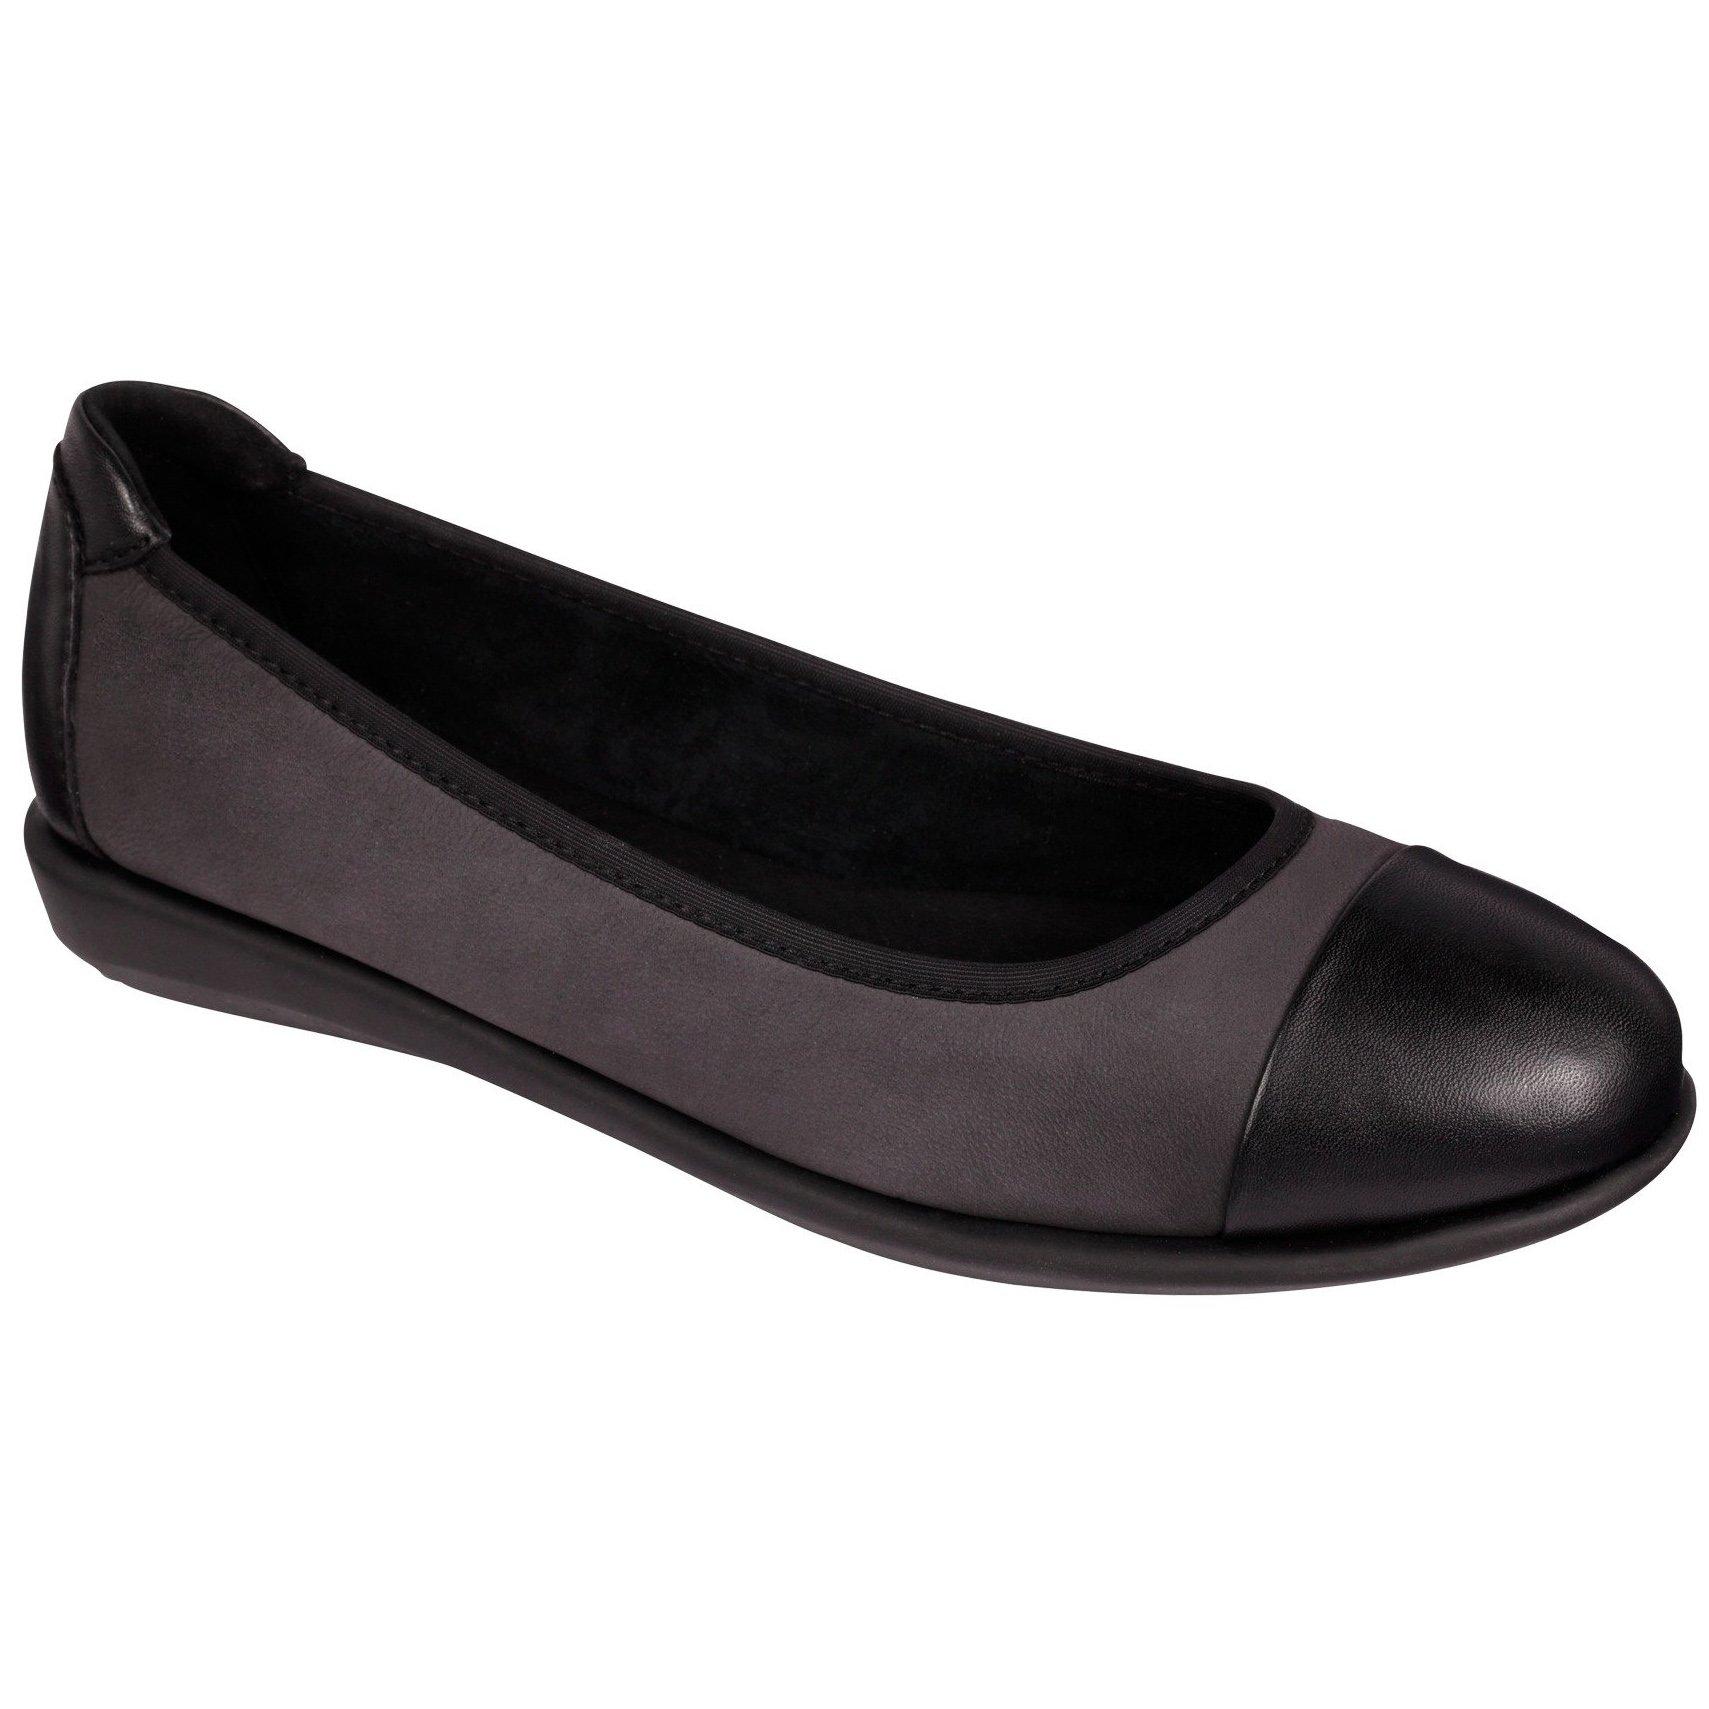 8b67c091691 Dr Scholl Shoes Akita Grey Γκρι - Μαύρο Γυναικεία Ανατομικά ...